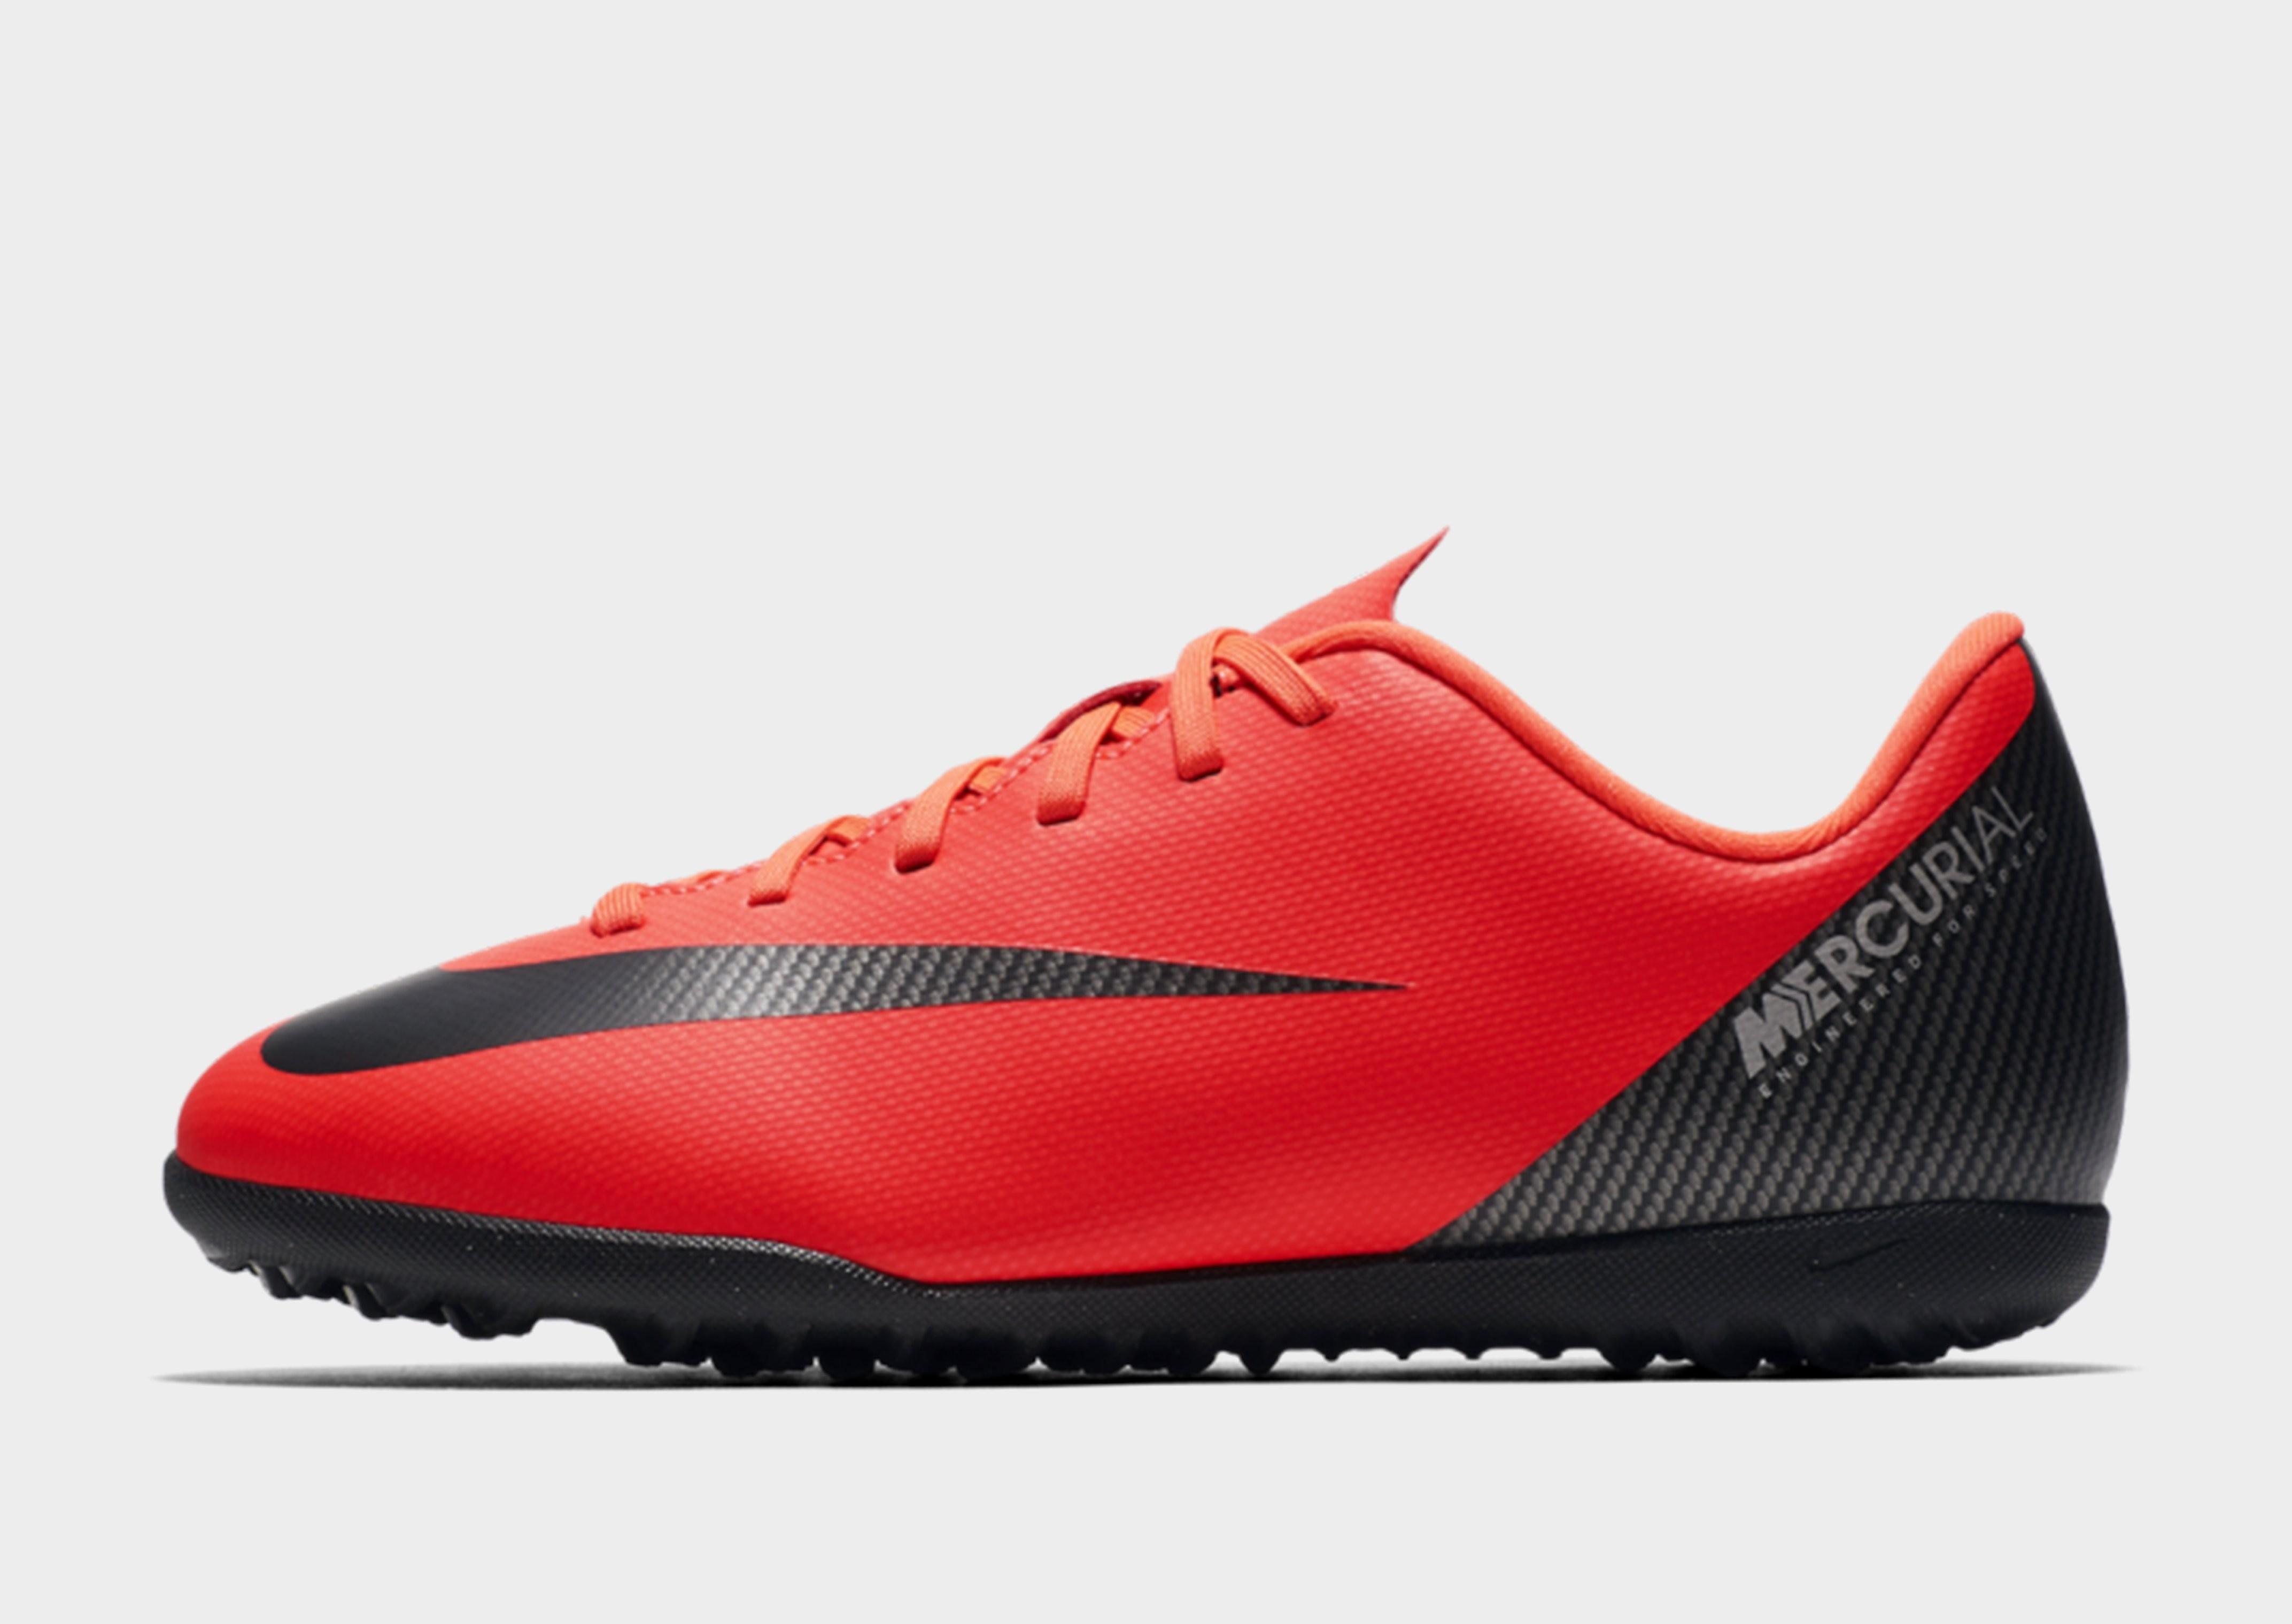 low priced 2dc28 d59d2 Bild på Nike CR7 Chapter 7 Mercurial Club TF Junior, Röd